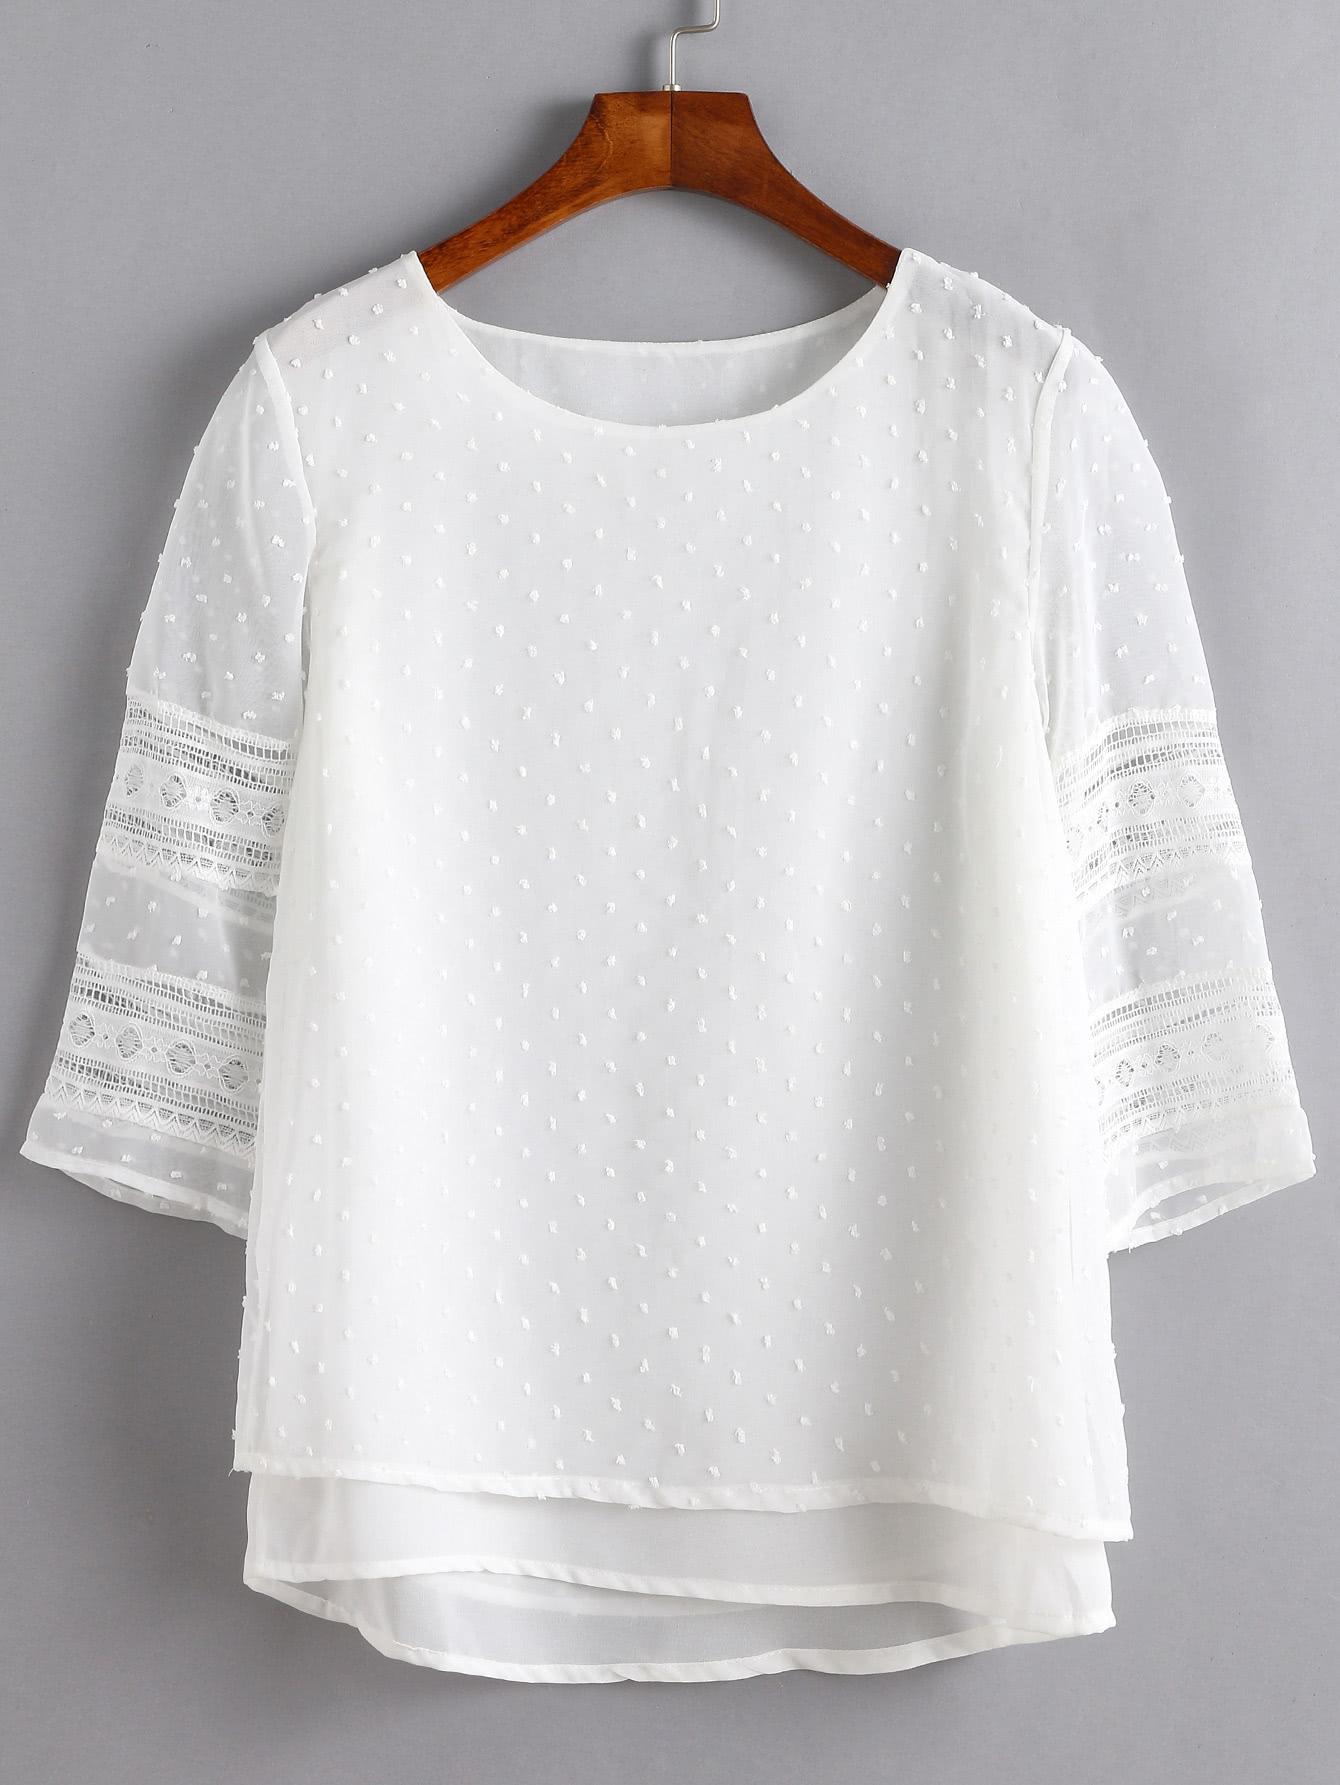 Blusas Tallas grandes por menos de 15 euros en Shein - blusa blanca tallas grandes